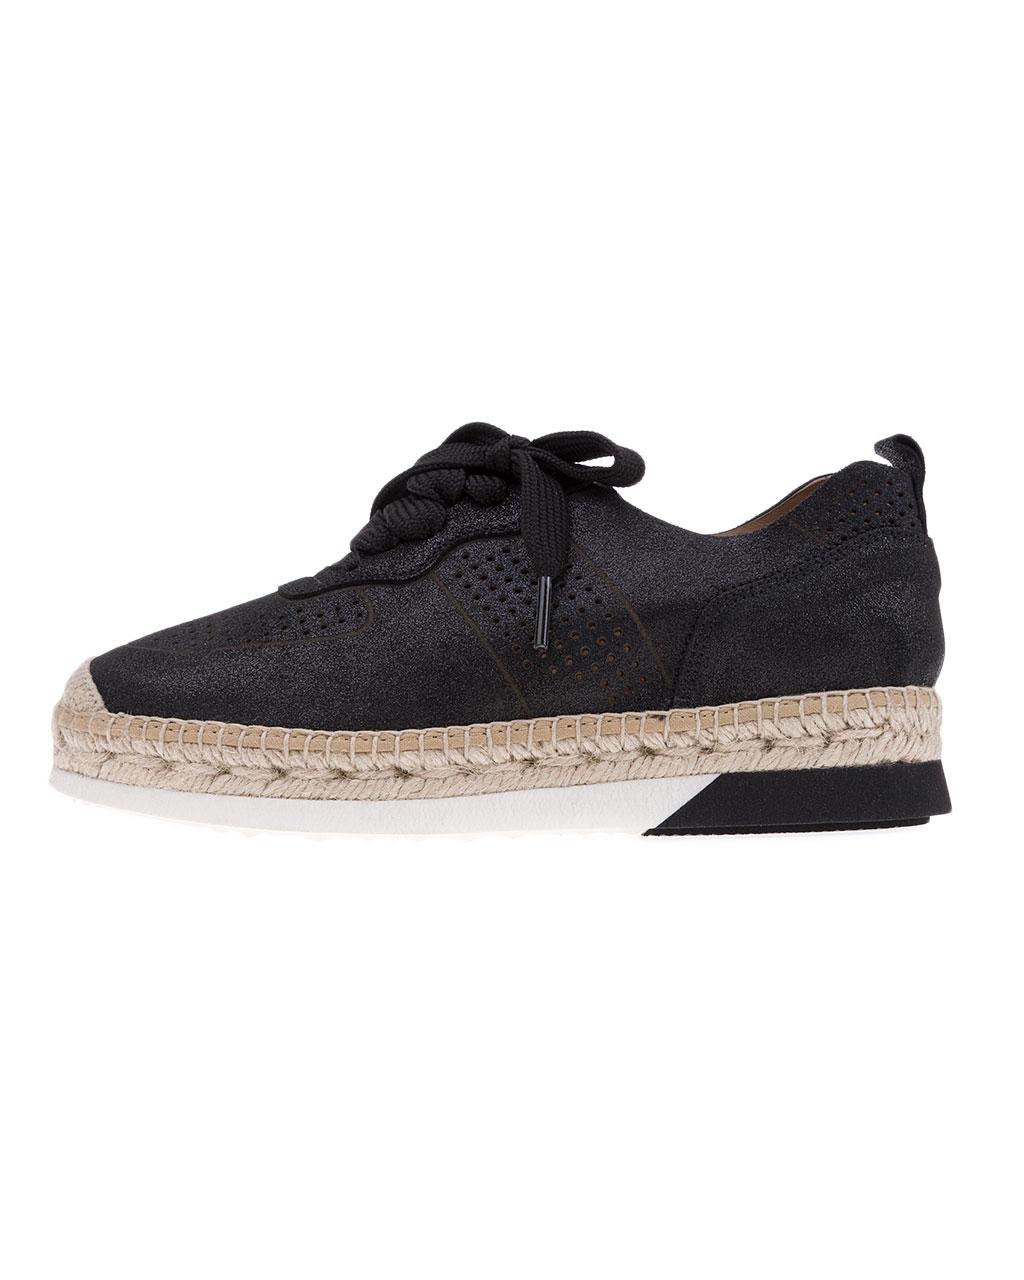 Women's shoes KANNA (original) 19KV9033-черн /91 — buy